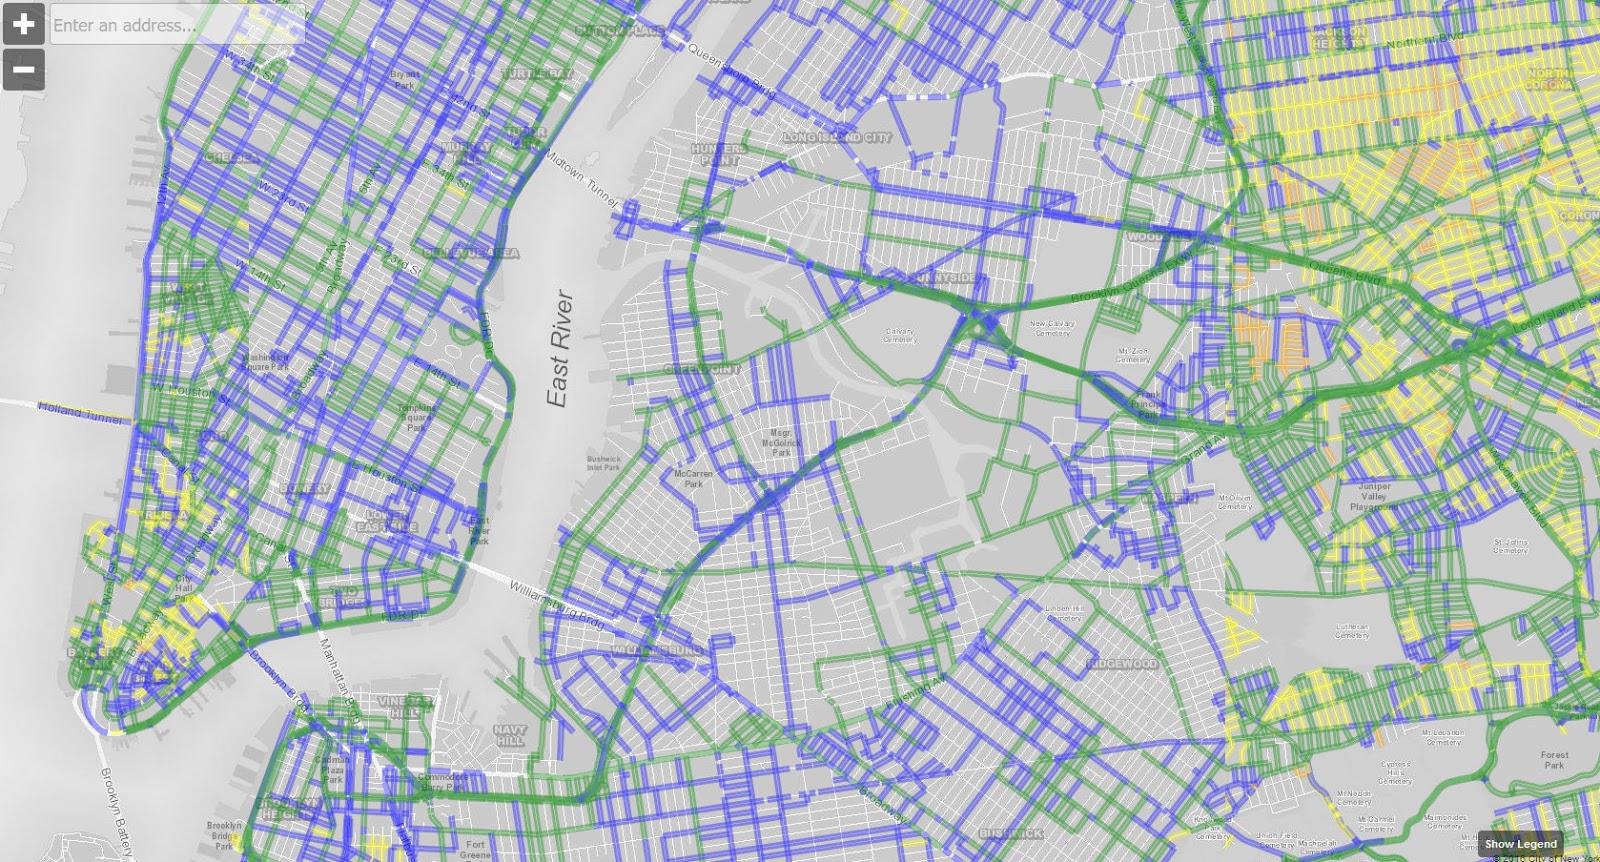 http://maps.nyc.gov/snow/